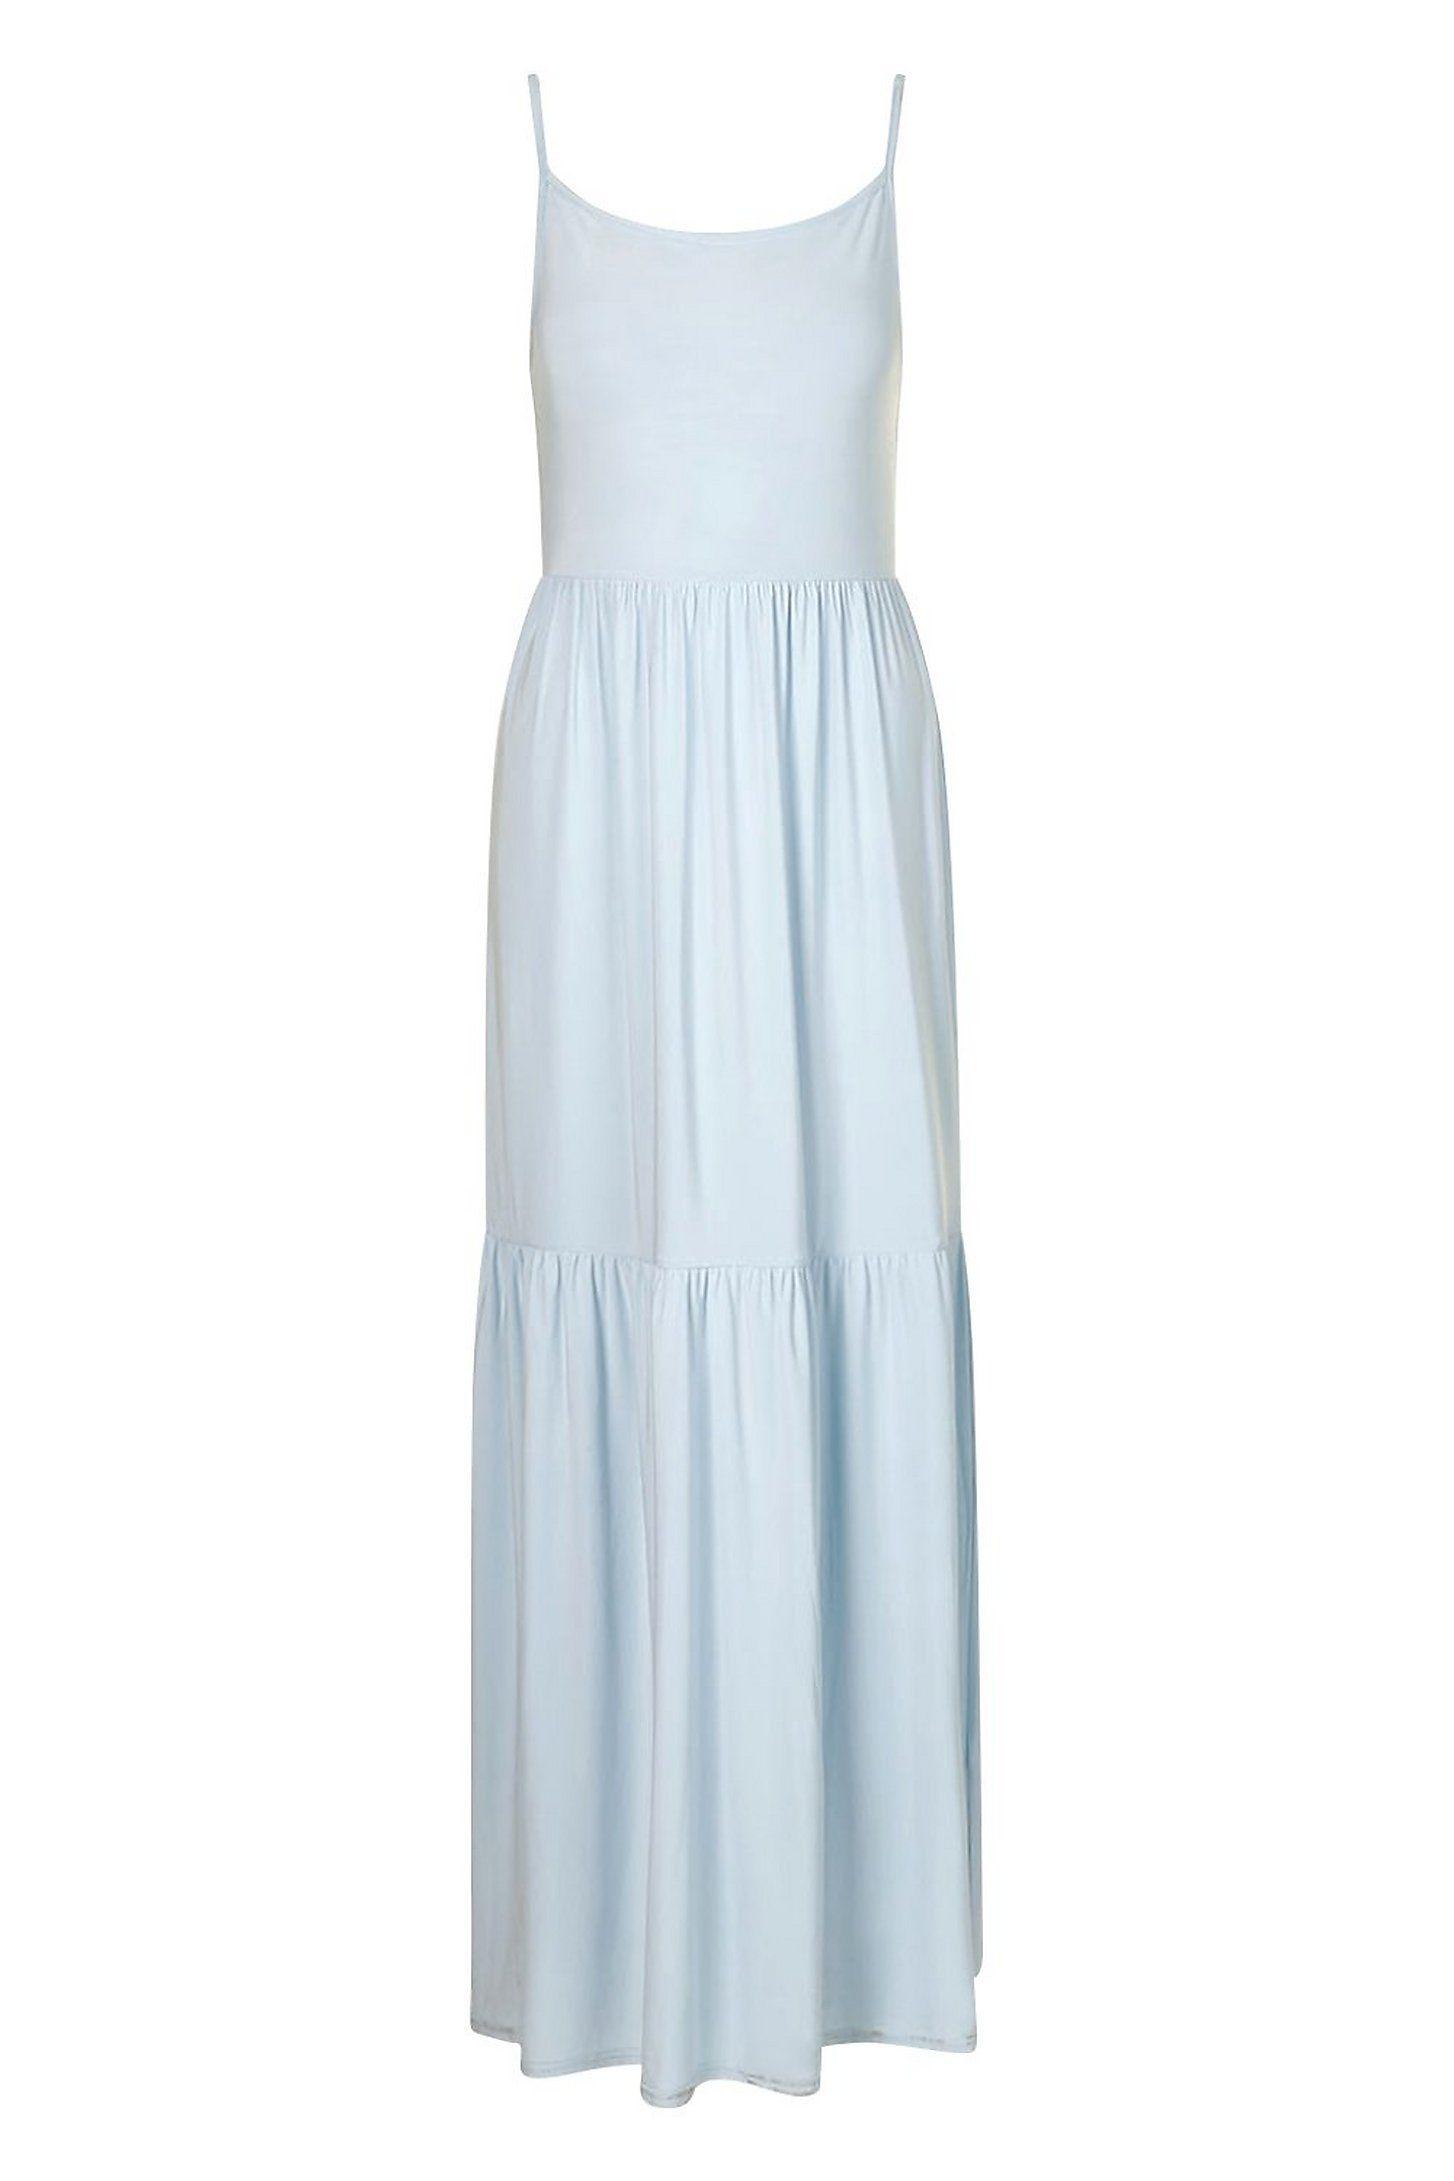 Tiered Strappy Maxi Dress Boohoo Maxi Dress Dresses Maxi Dress Collection [ 2181 x 1454 Pixel ]